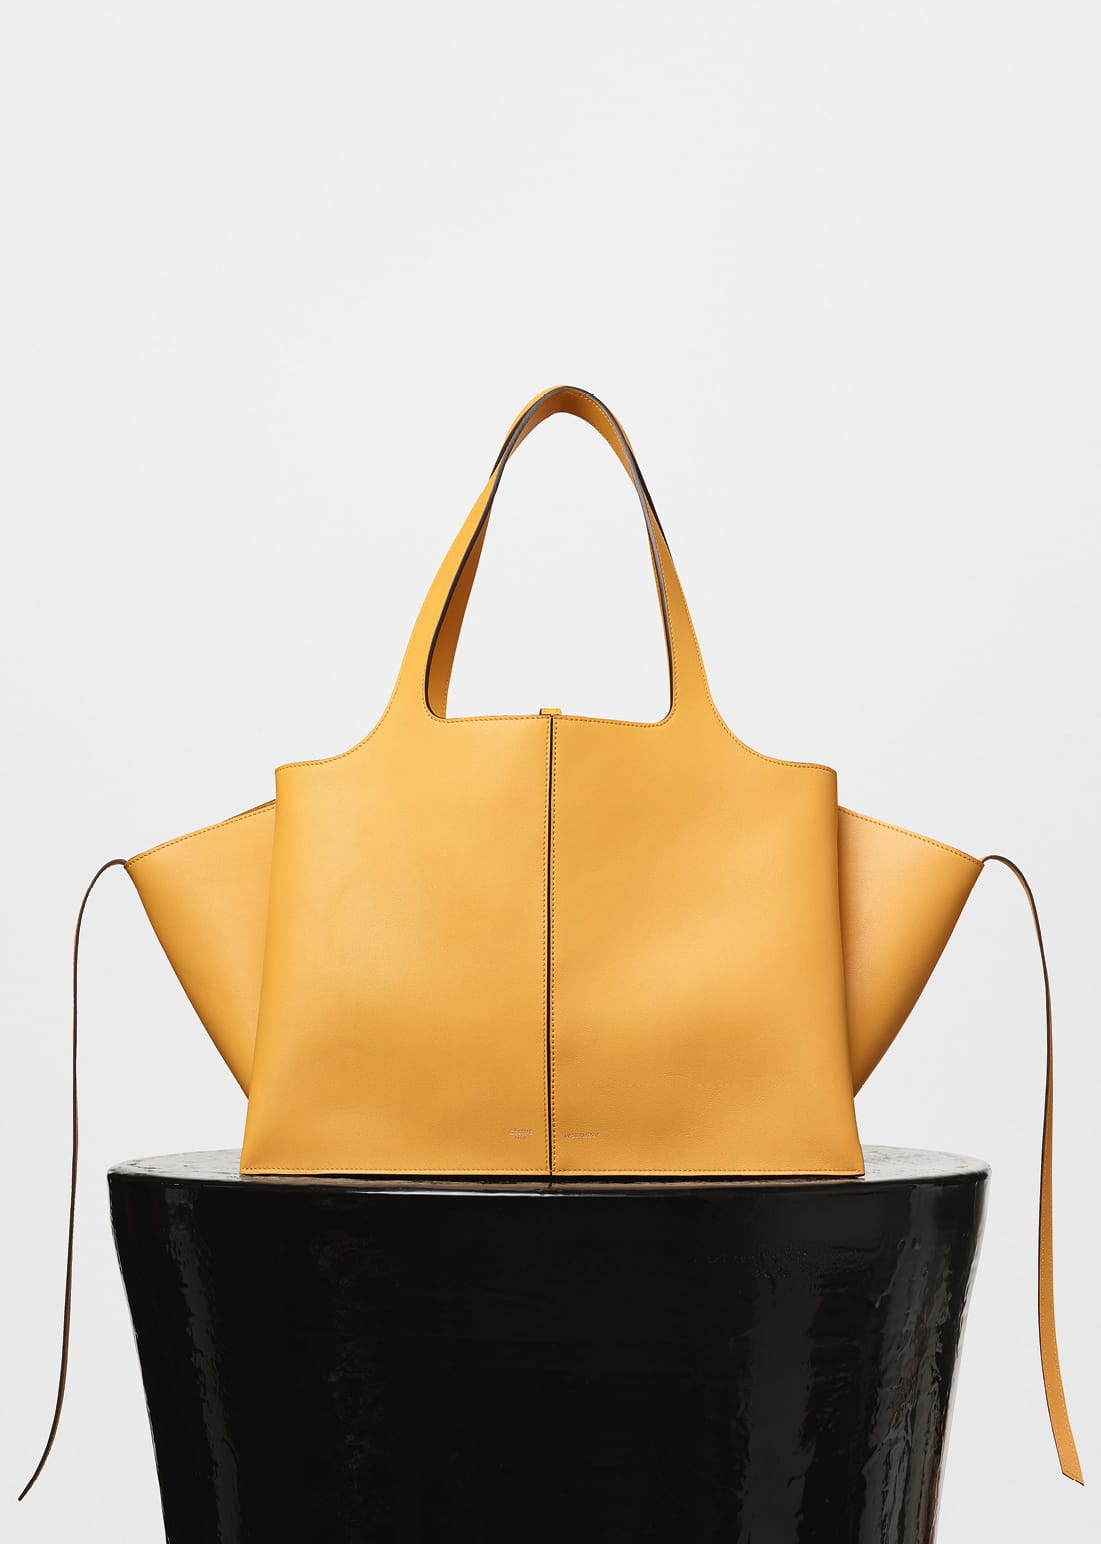 8fcce32596 Discover Céline s New Must-Have  Tri-Fold  Bag - Savoir Flair